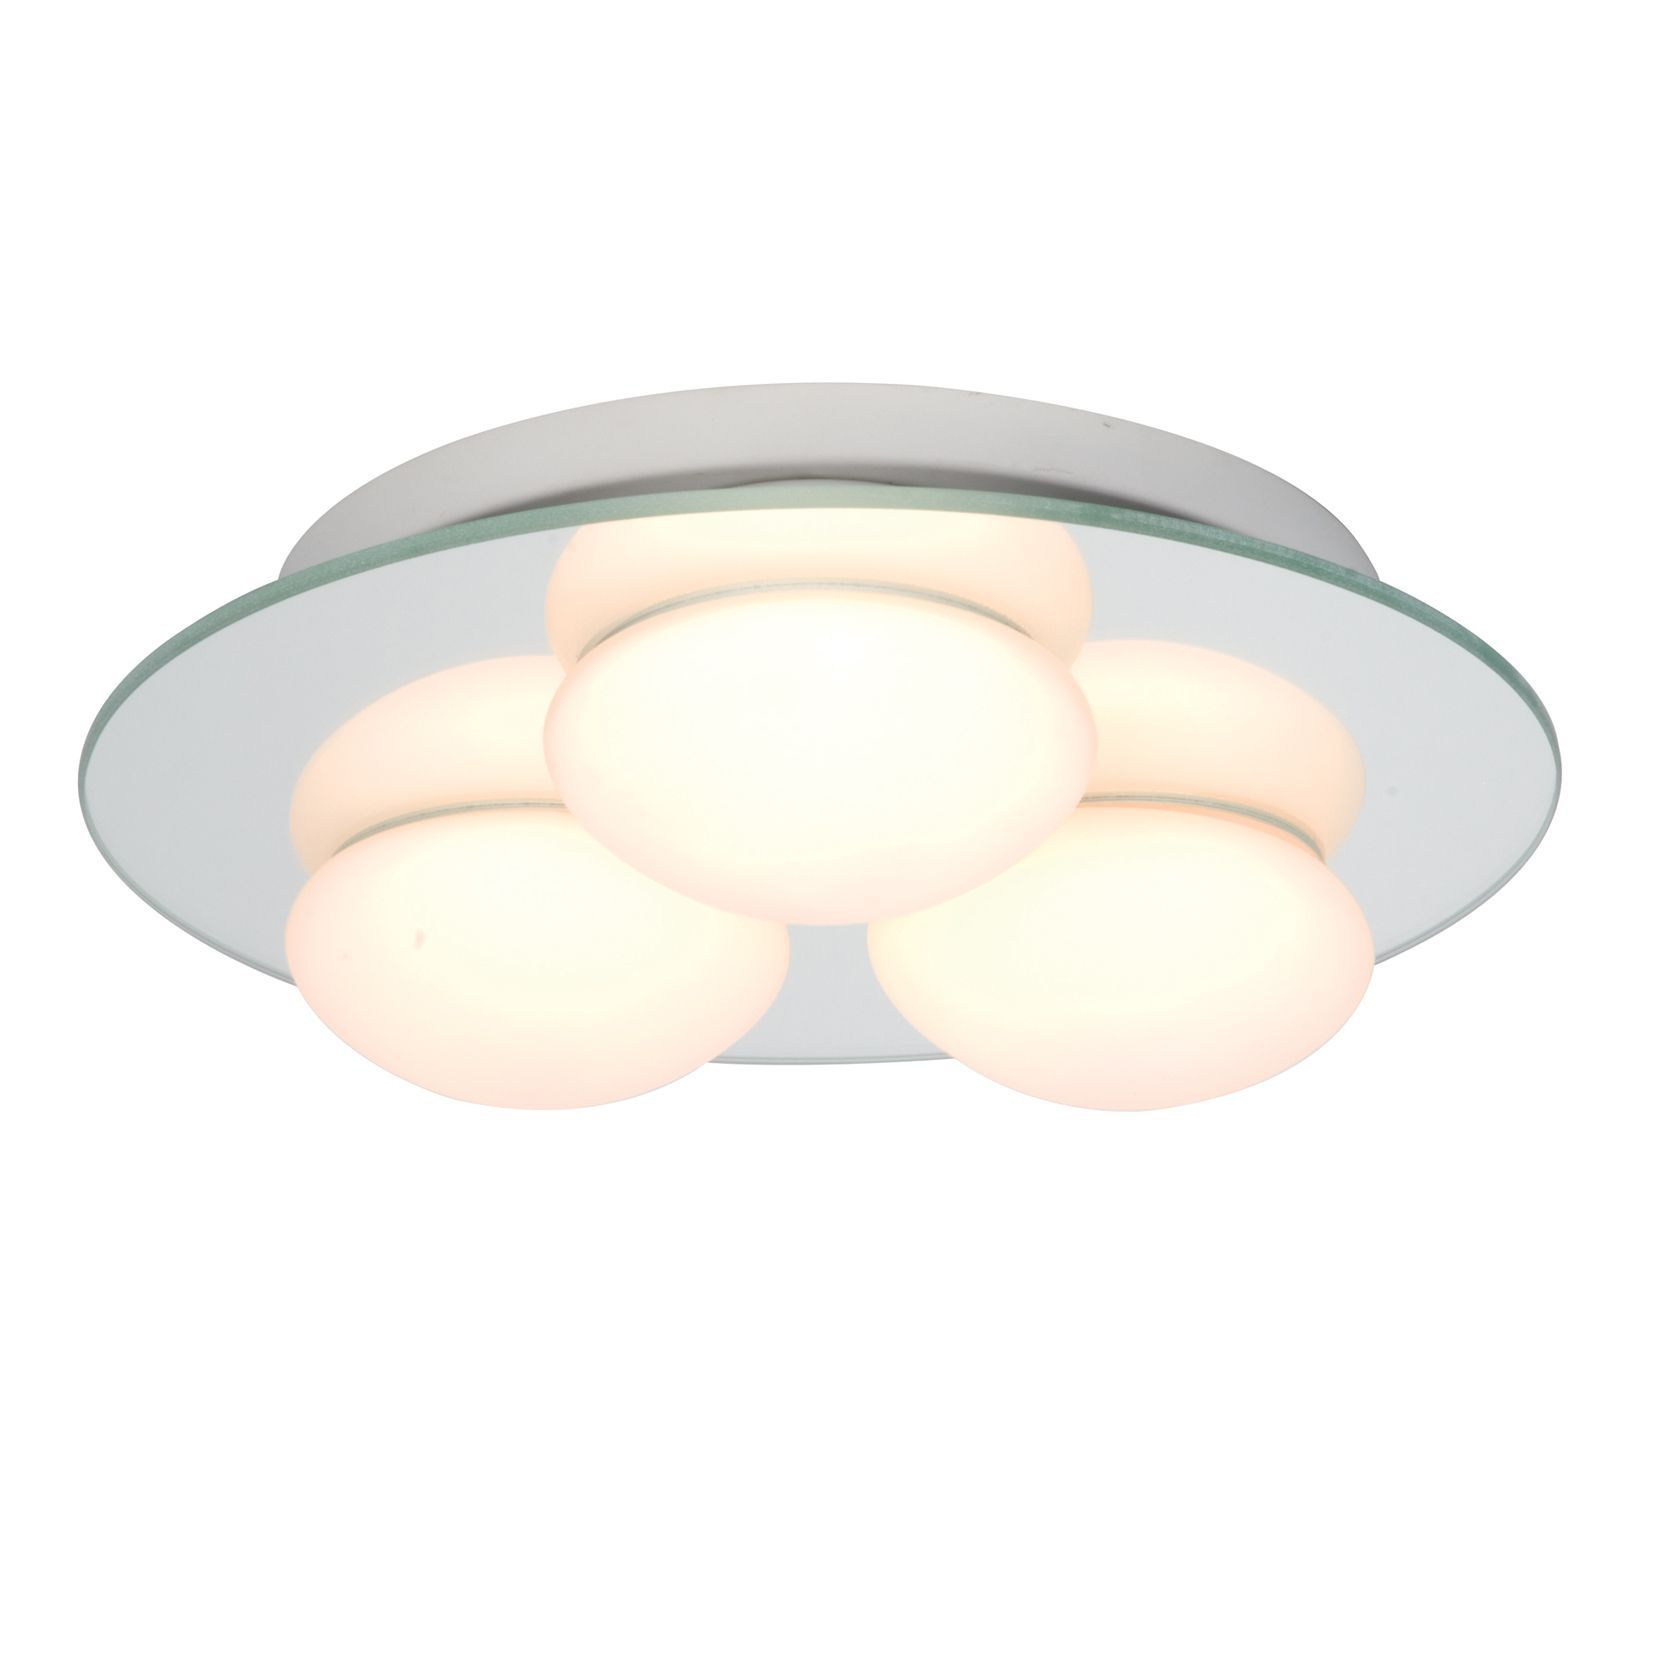 Bathroom Ceiling Lights At B&Q revel silver mirrored effect 3 lamp bathroom flush light